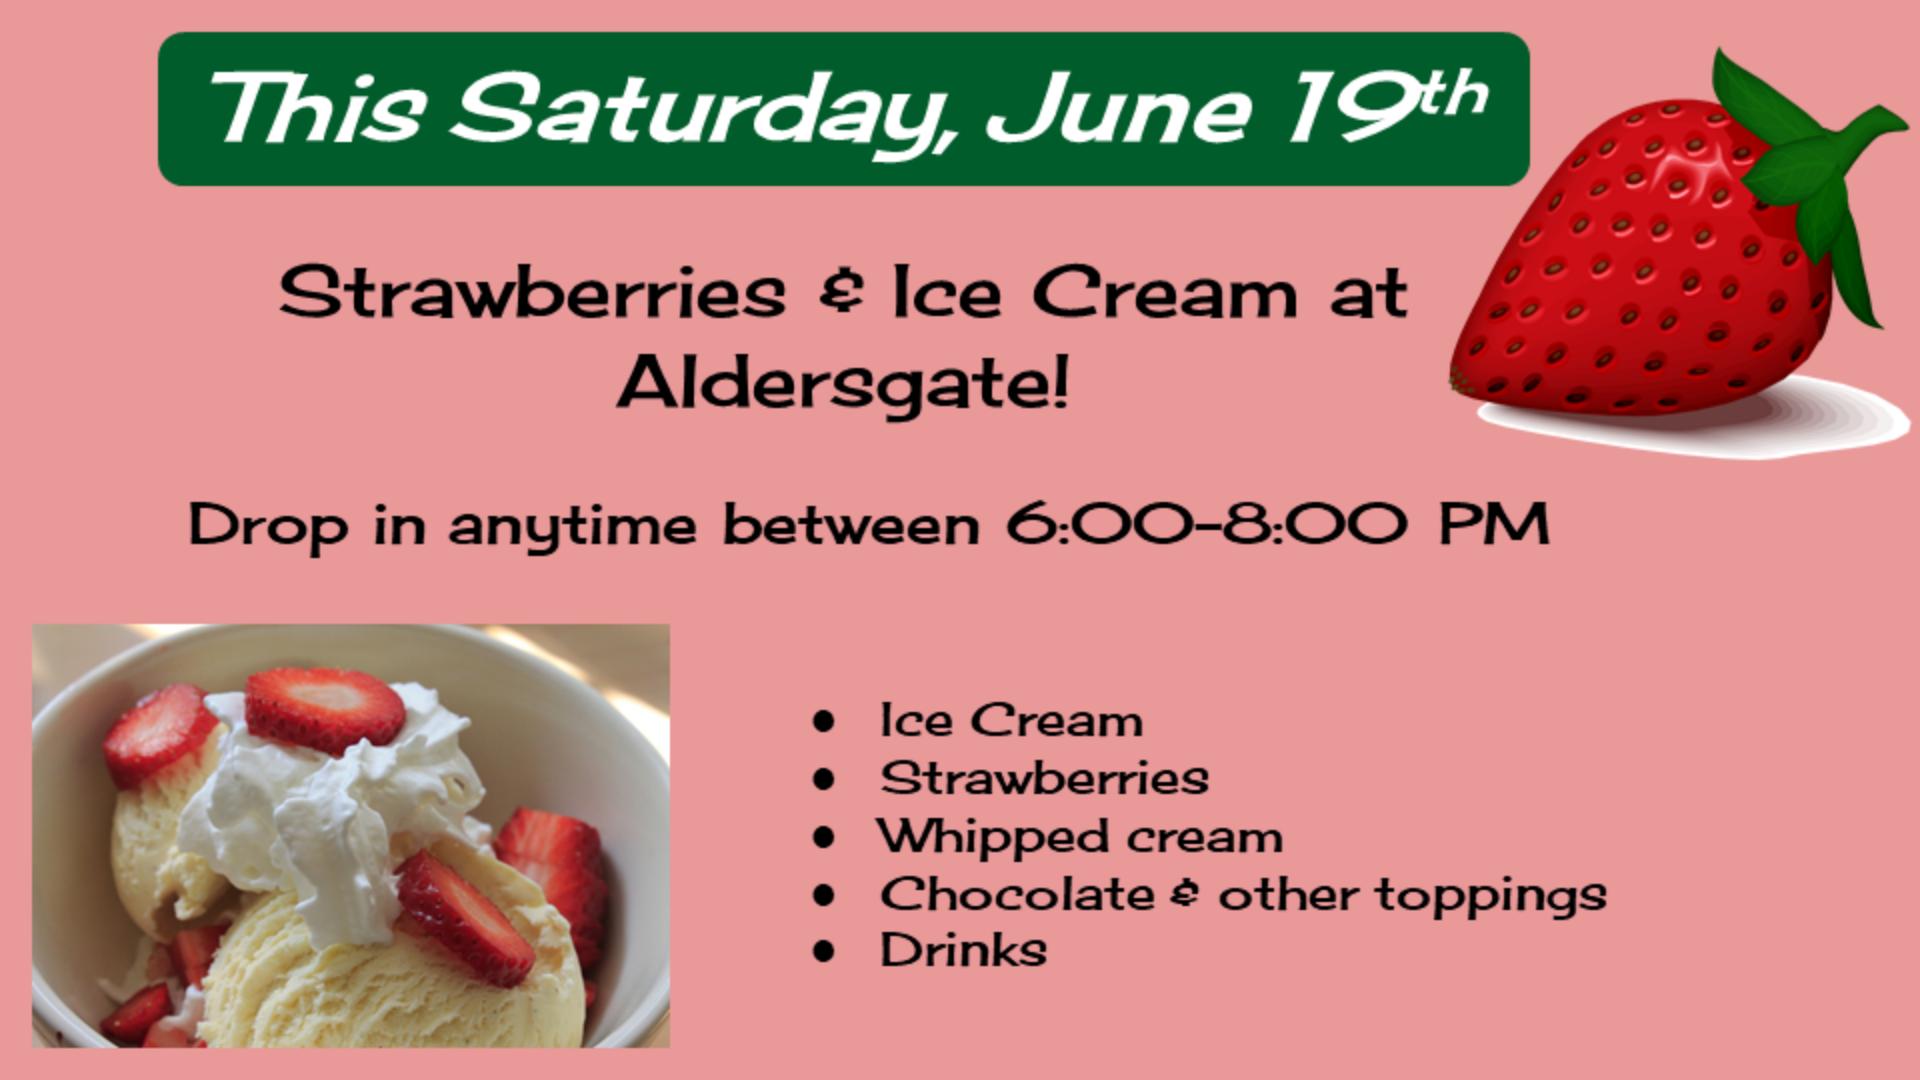 This Saturday, June 19th - Strawberries and Ice Cream at Aldersgate